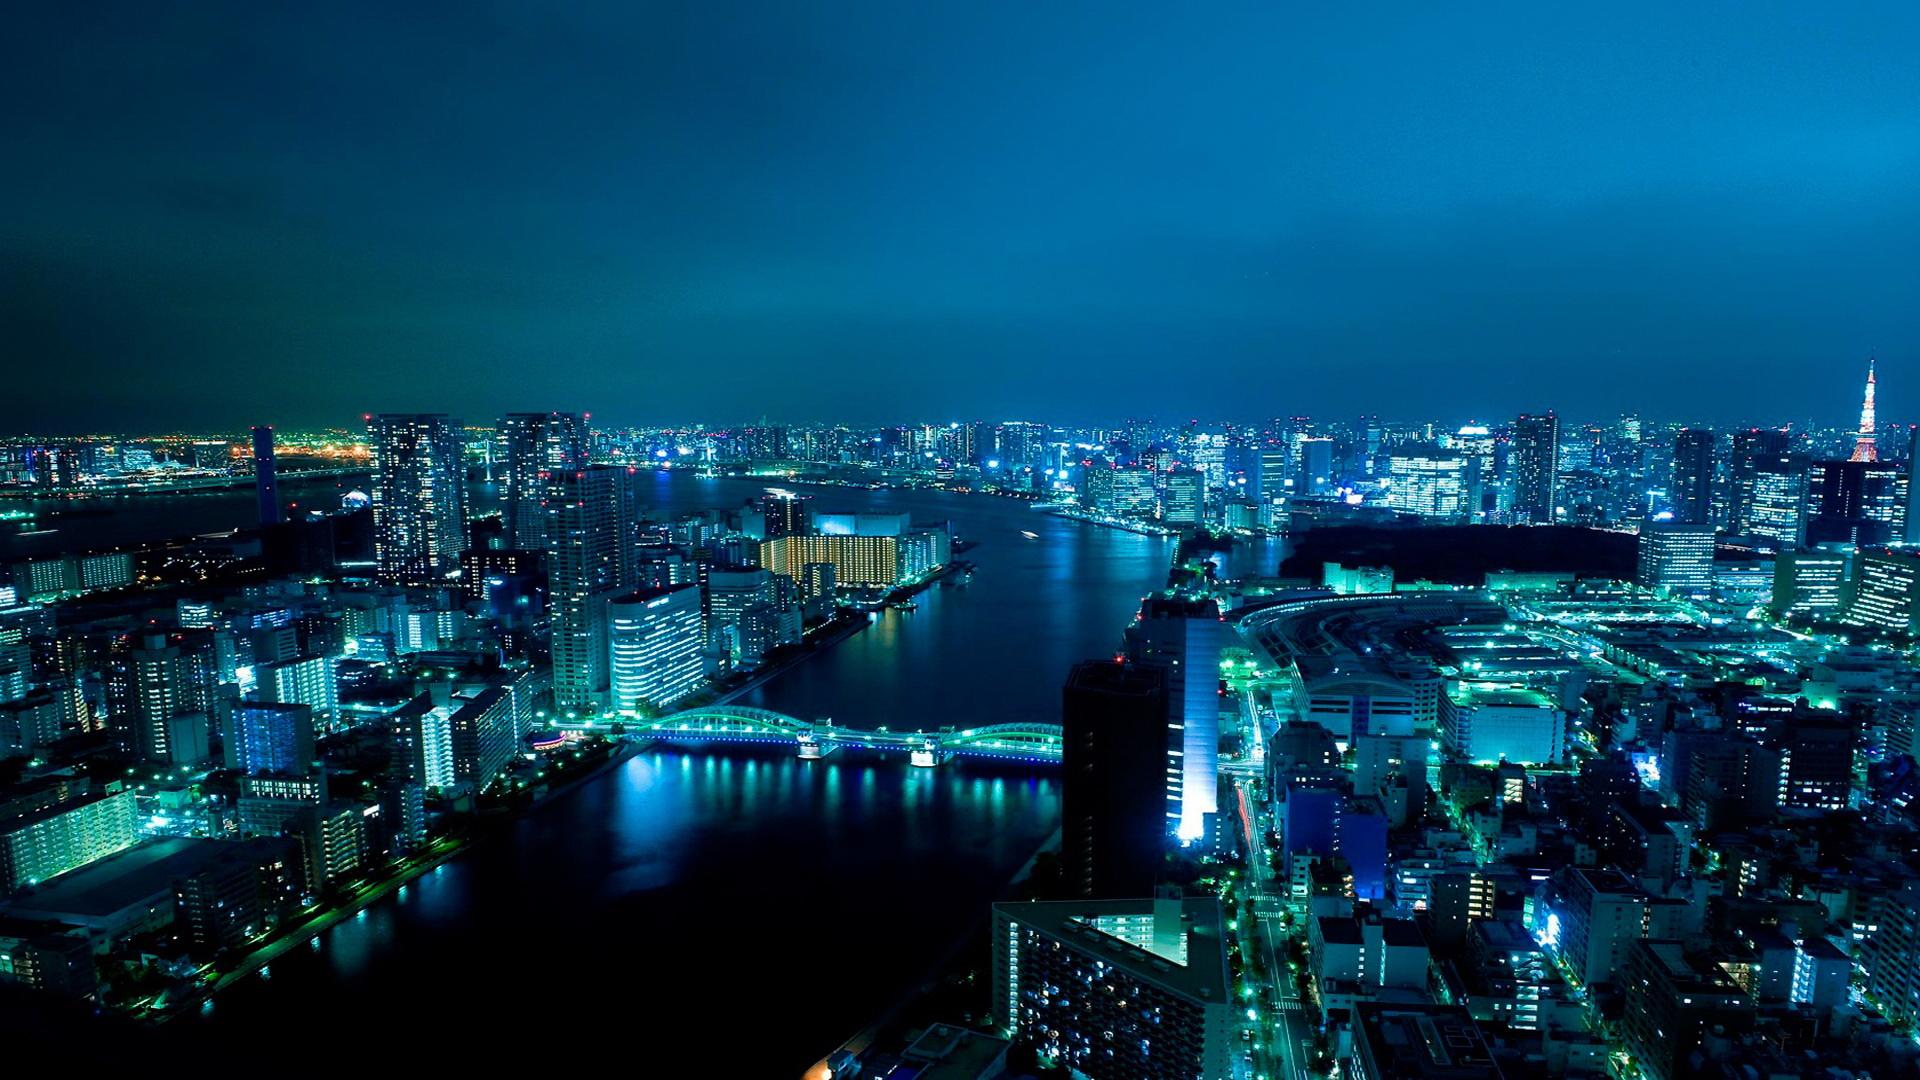 City HD Wallpaper Images For Desktop Download 1920x1080